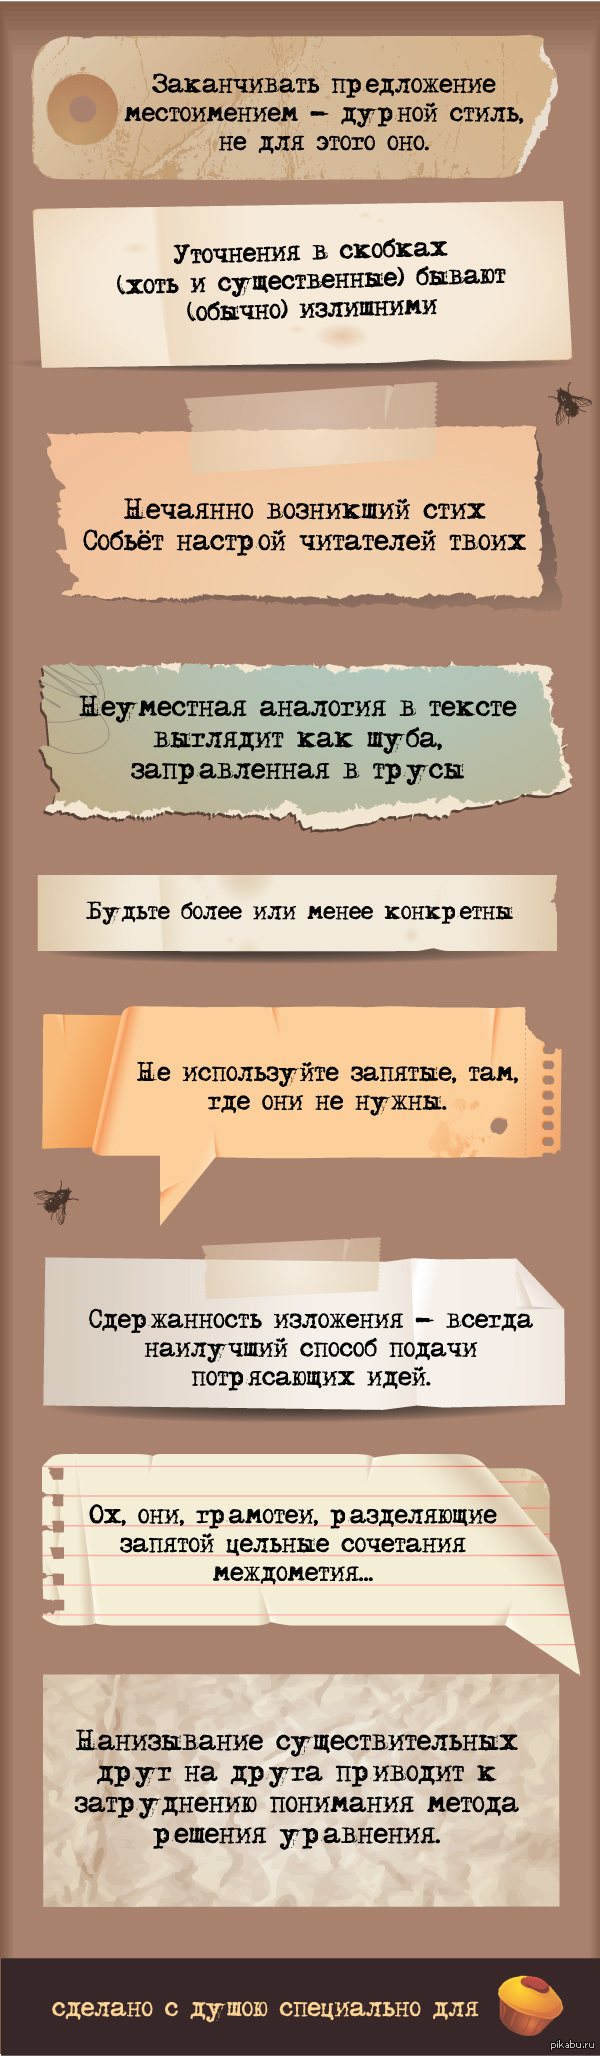 http://s5.pikabu.ru/post_img/2014/08/08/8/1407498433_785384264.jpg